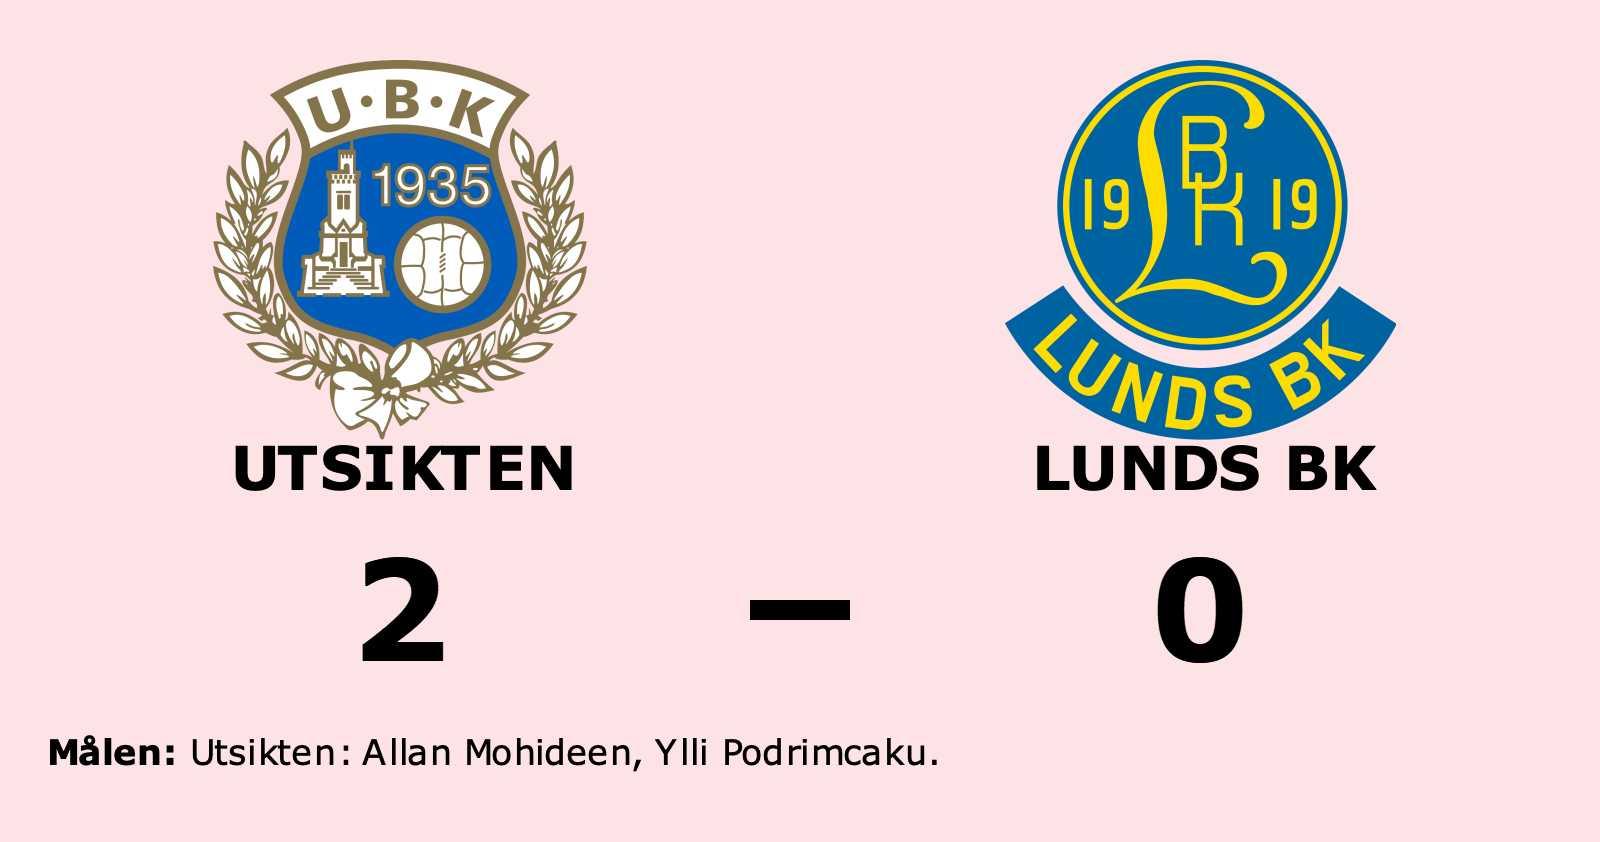 Lunds BK föll borta mot Utsikten